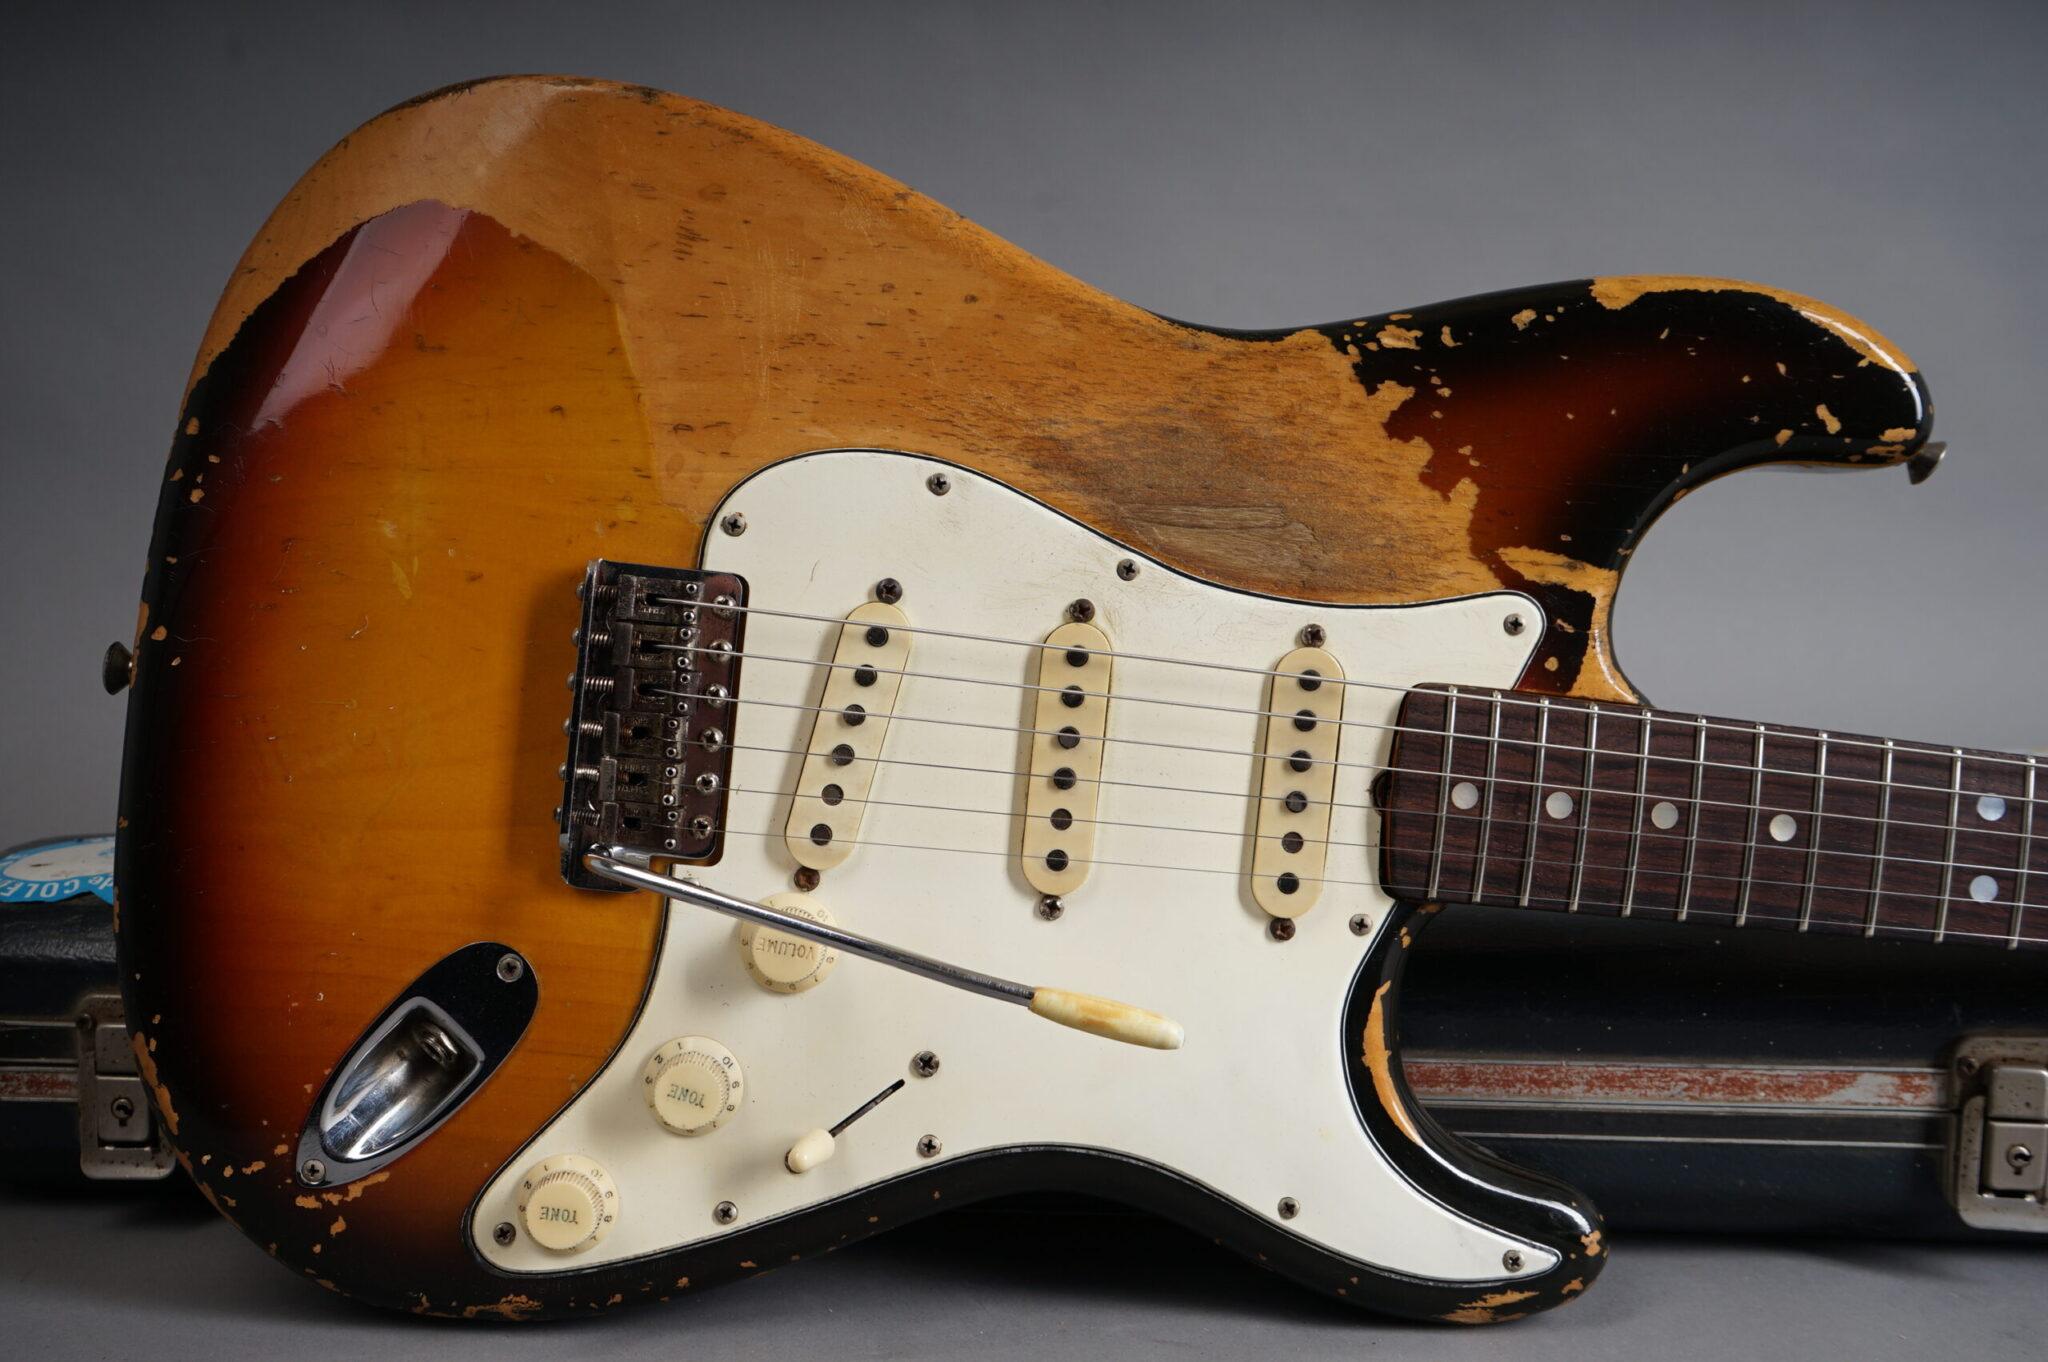 https://guitarpoint.de/app/uploads/products/1968-fender-stratocaster-sunburst-2/1968-Fender-Stratocaster-Sunburst-221095-10-scaled-2048x1362.jpg